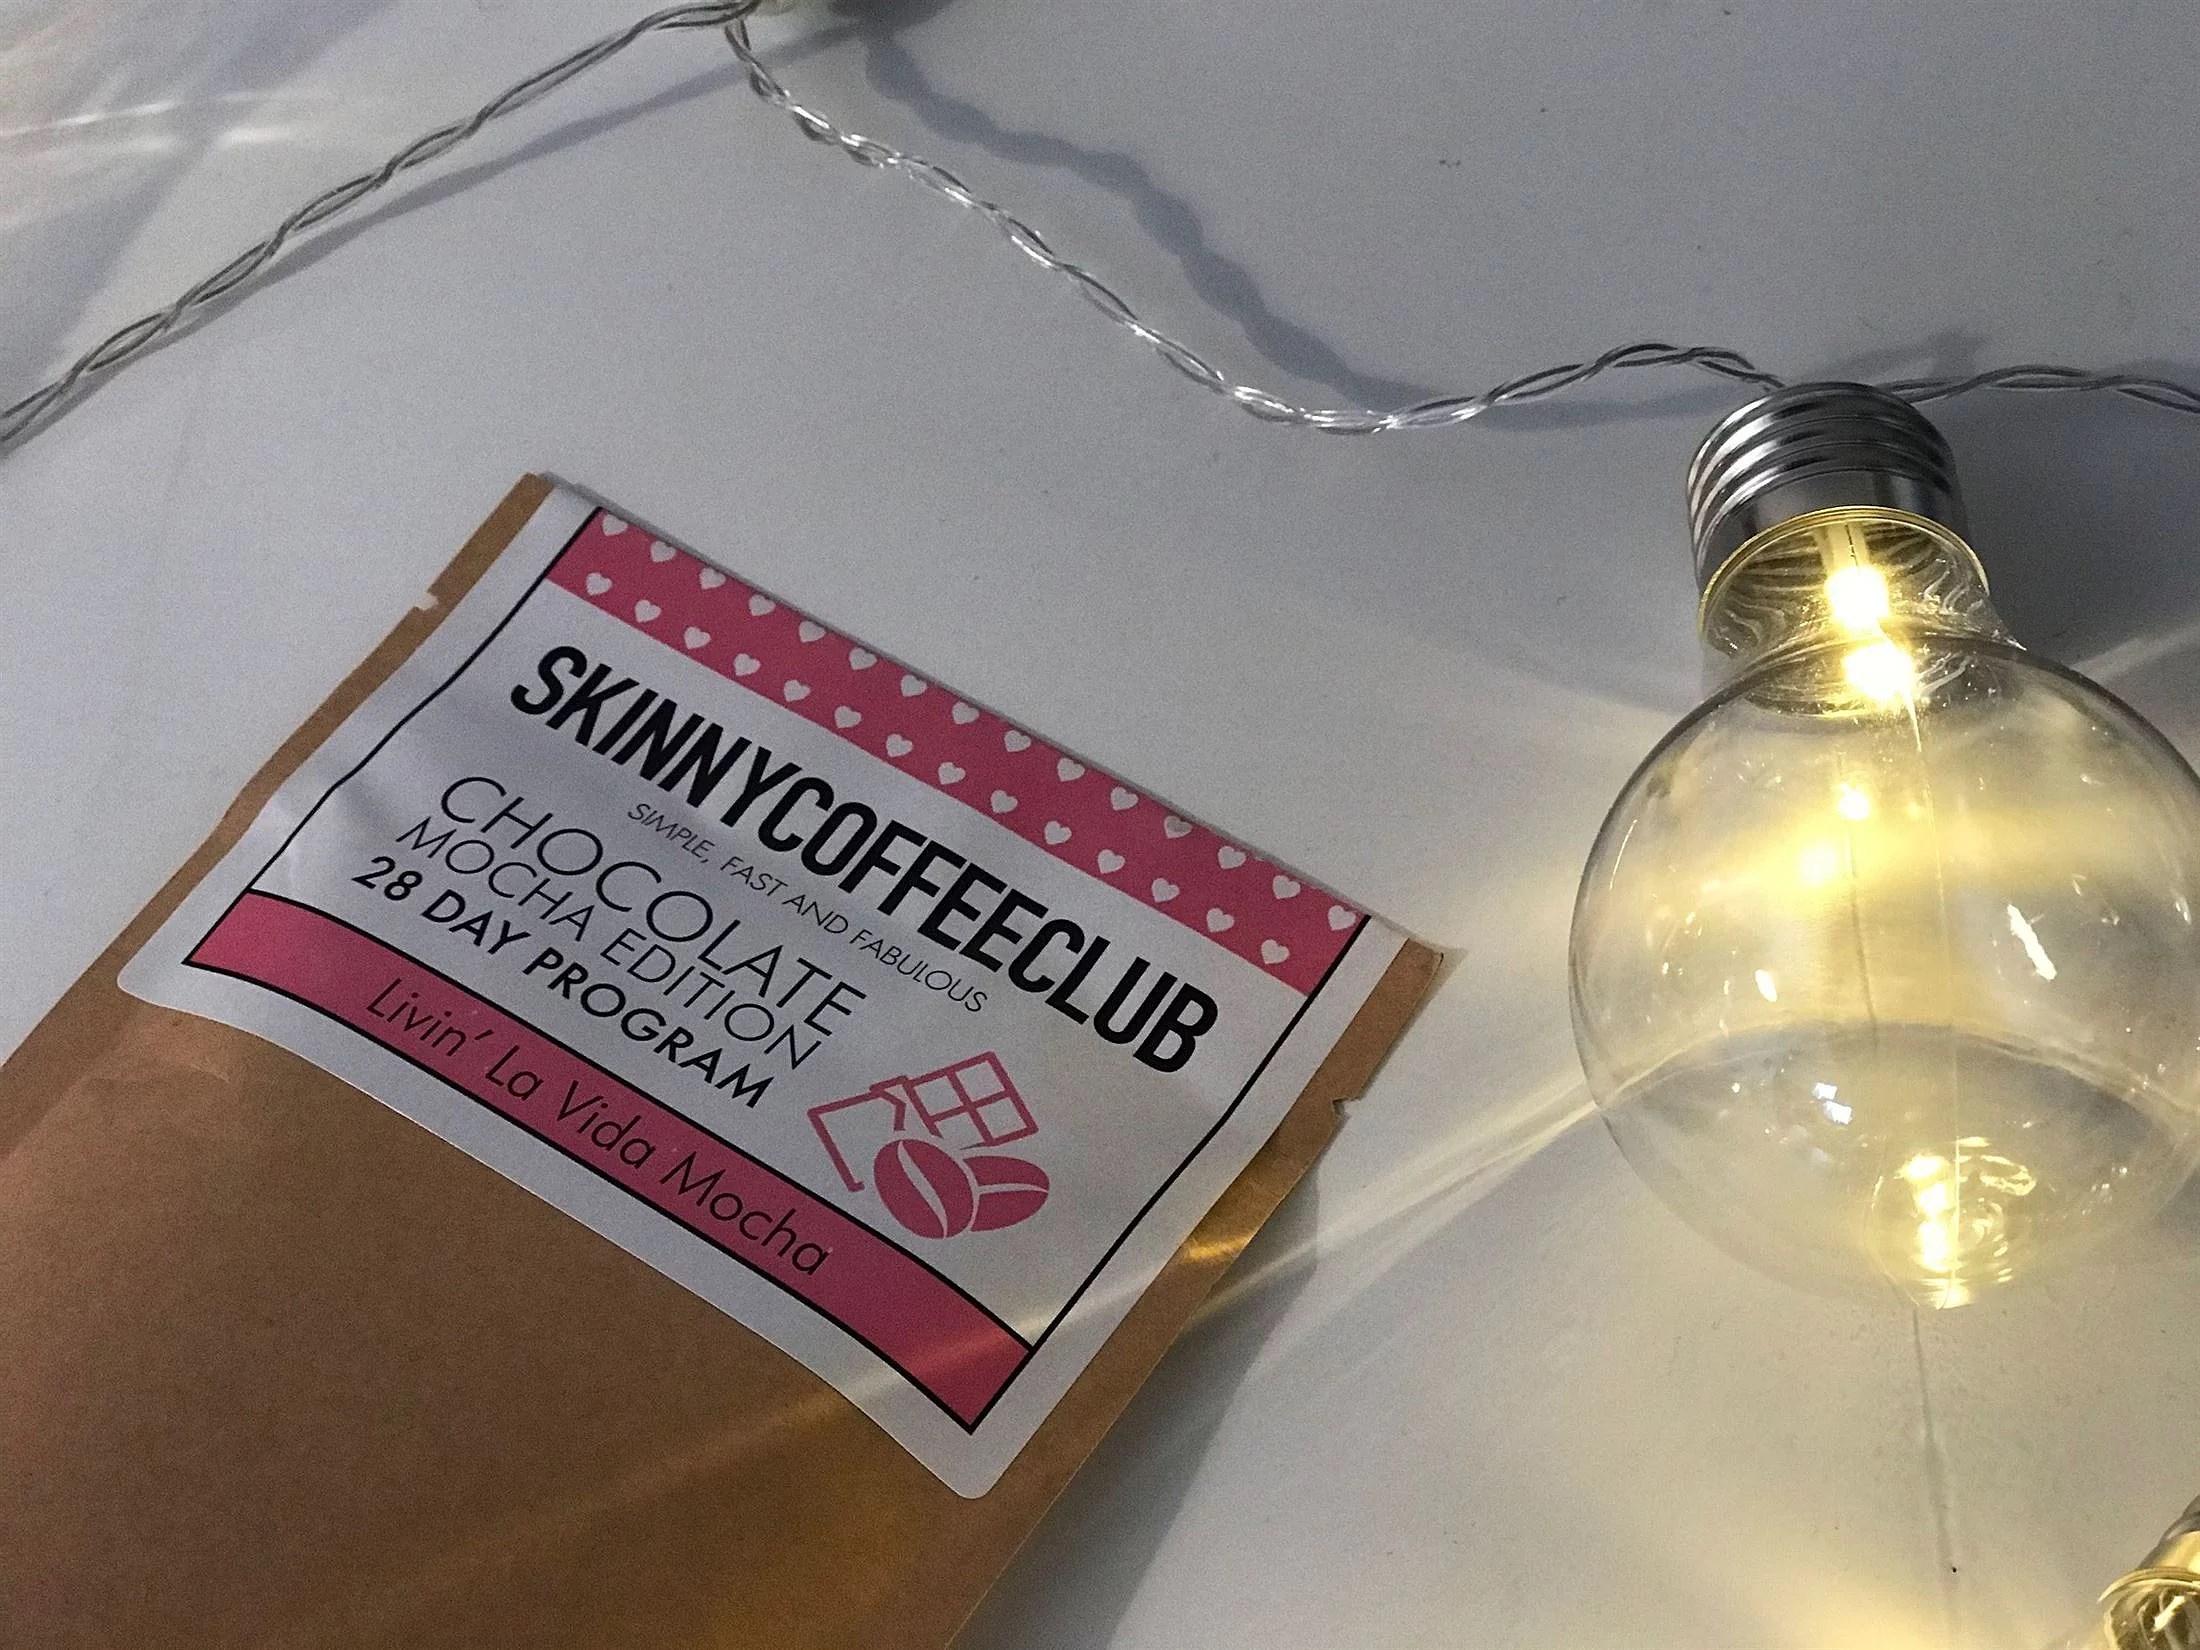 SkinnyCoffeeClub